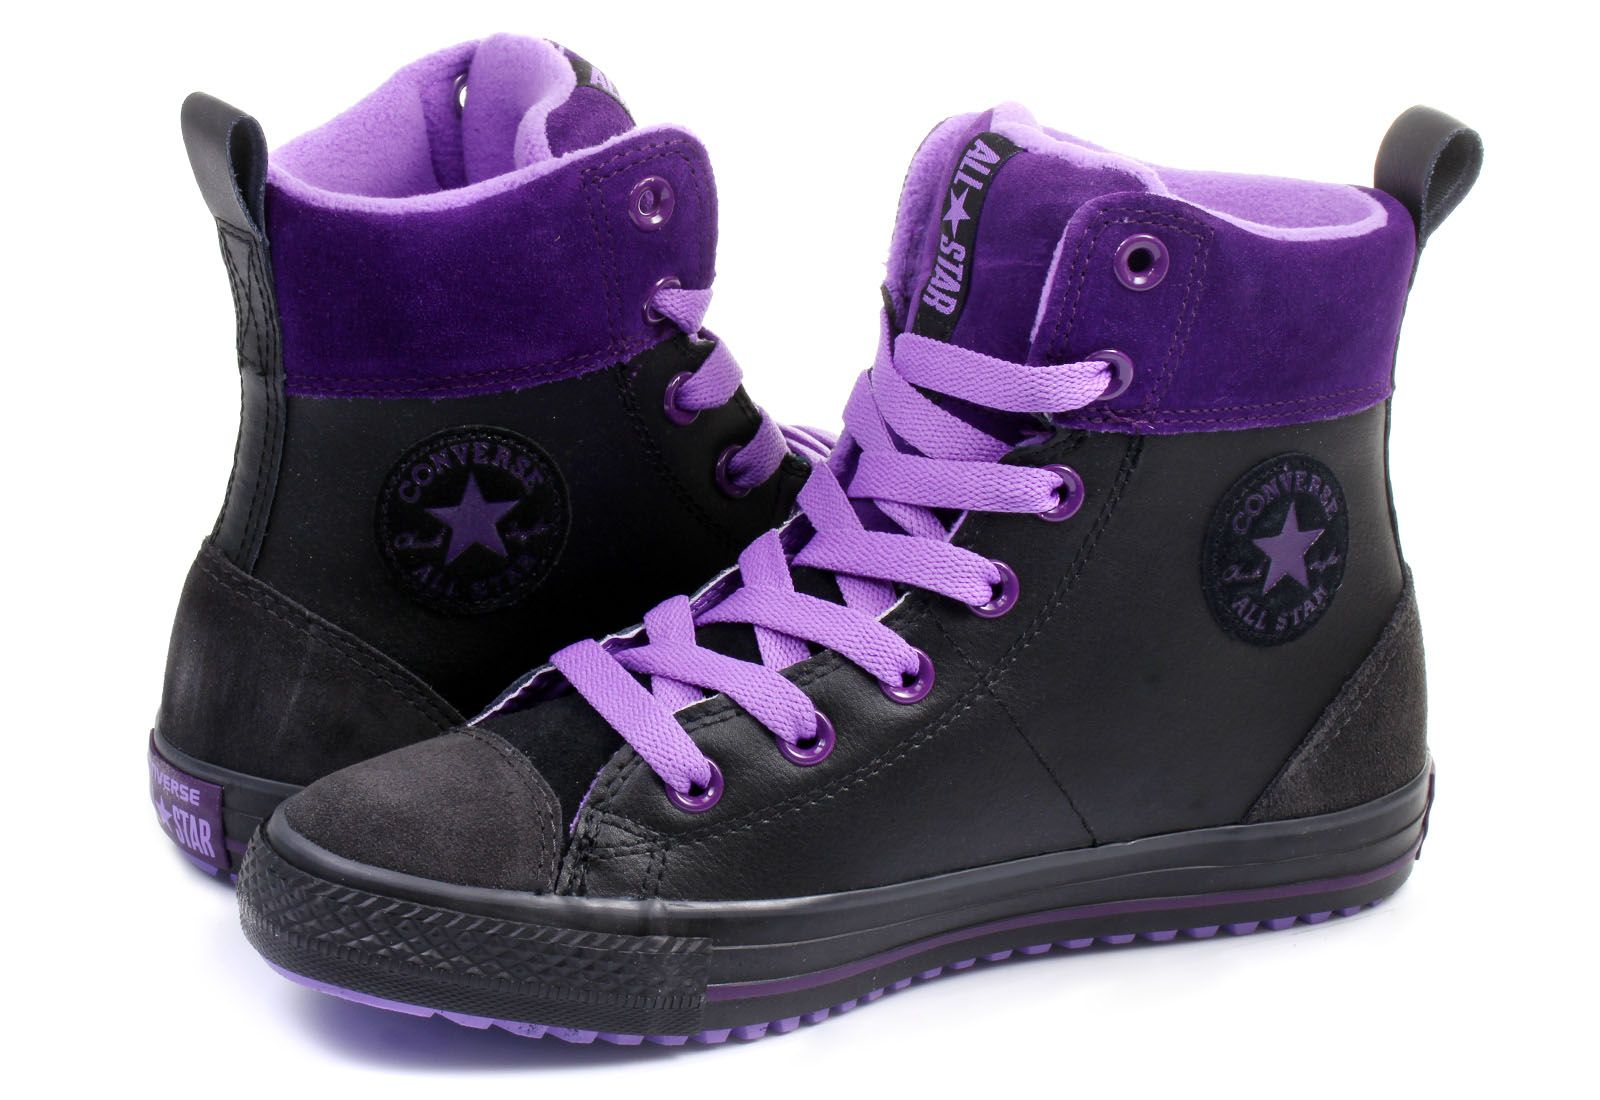 c2e437c0cf98 Converse Sneakers - Chuck Taylor All Star Asphalt Boot - 658067C ...